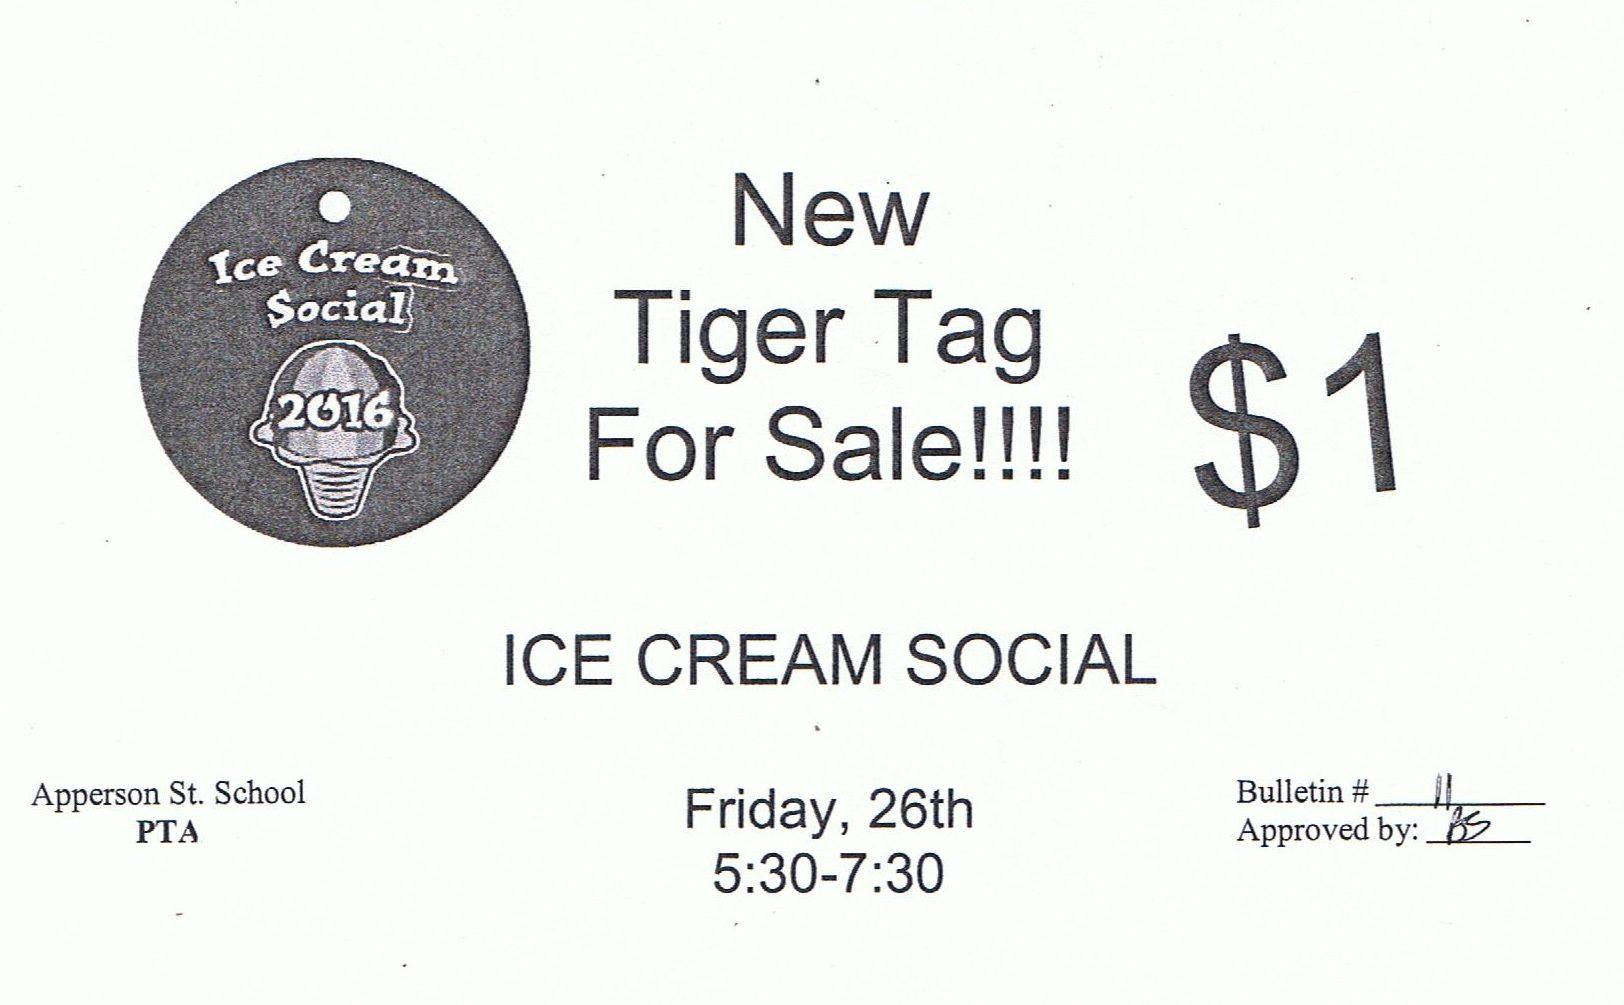 ice cream social tiger tag